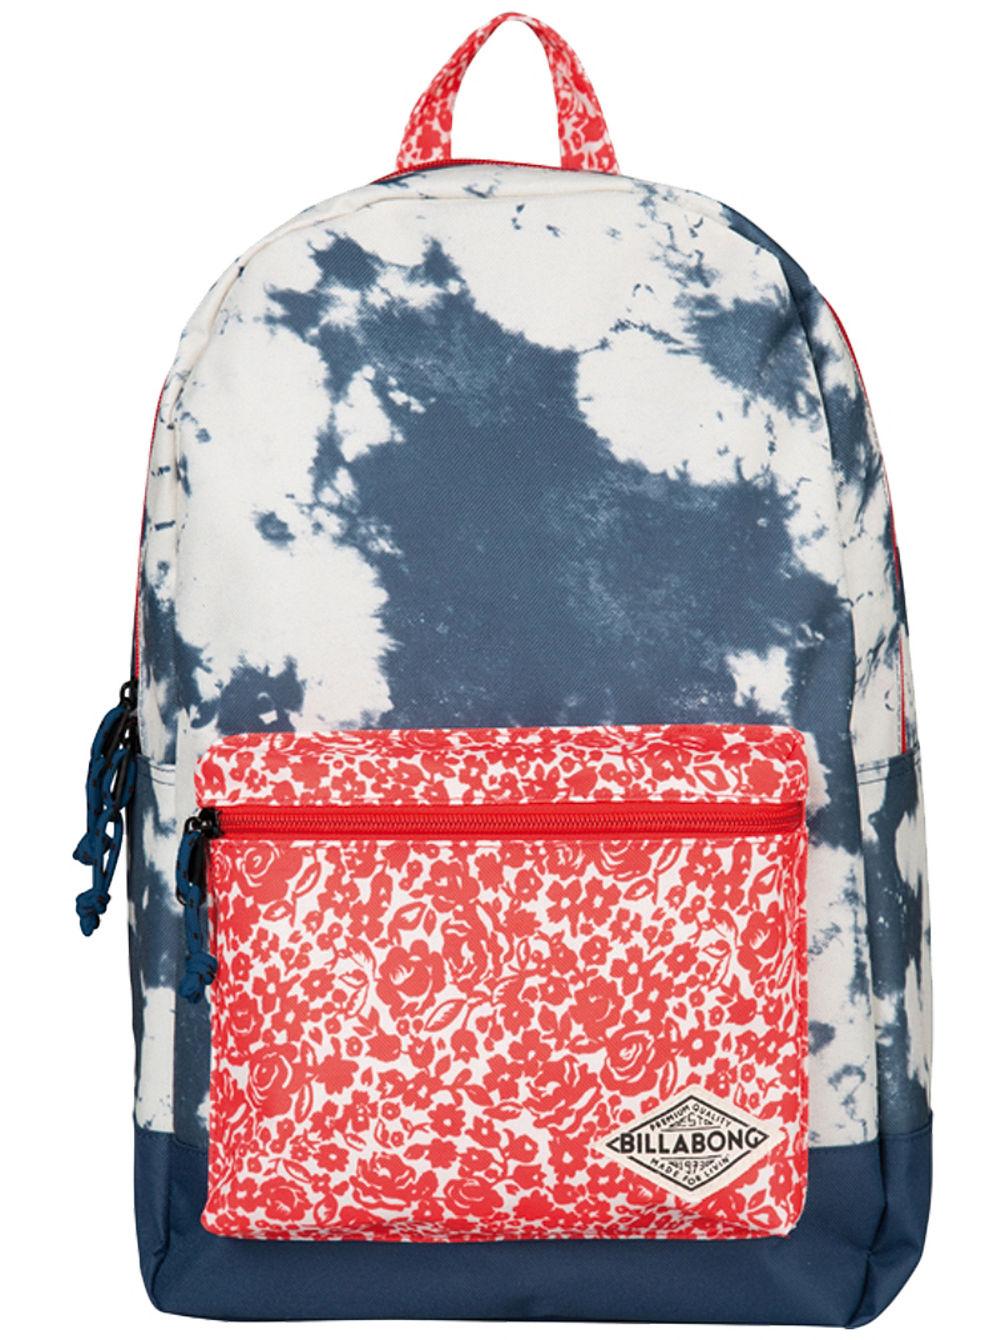 billabong-study-backpack